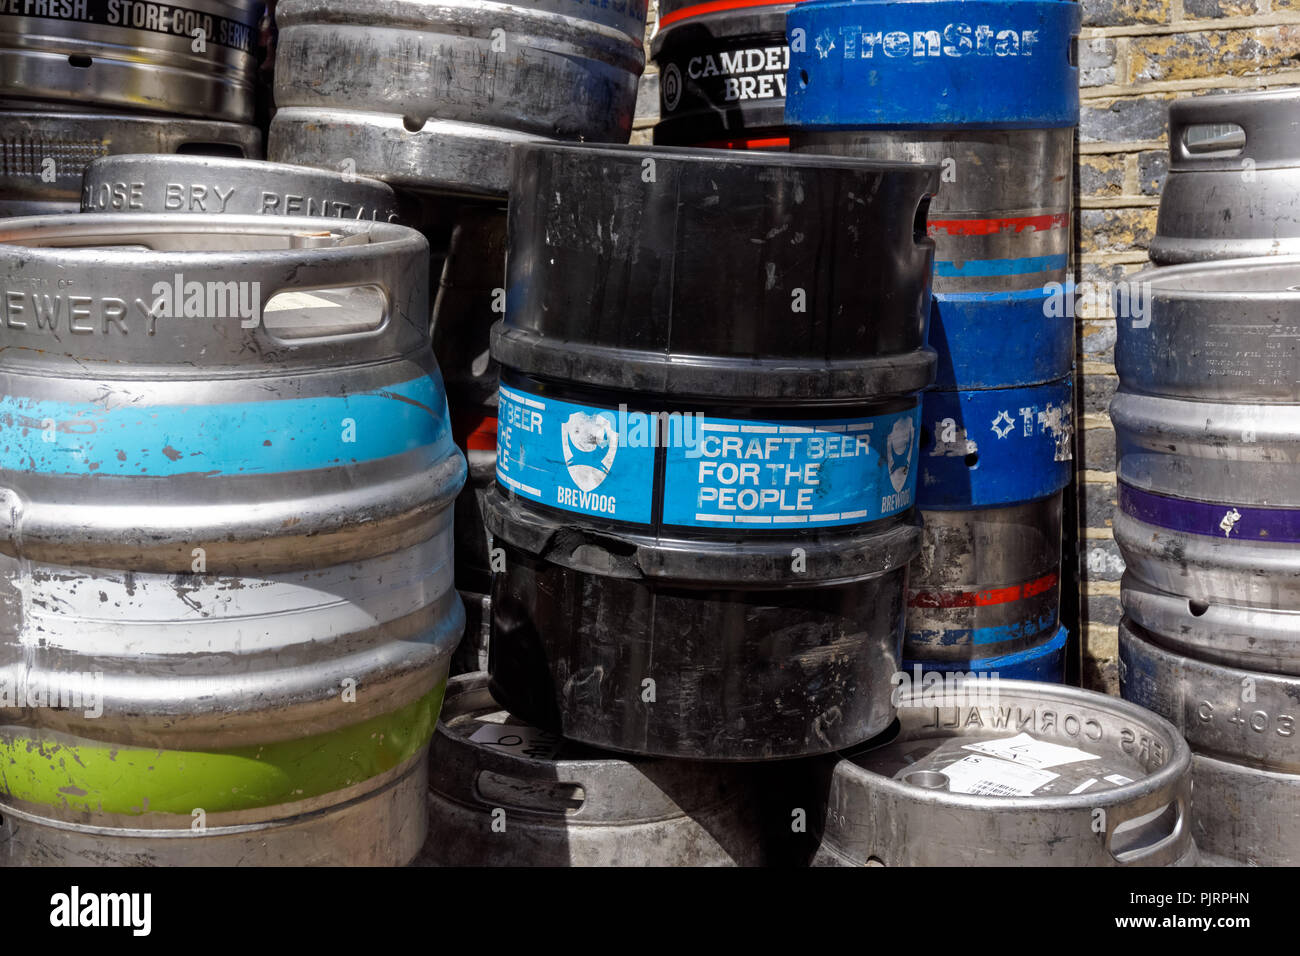 British beer casks - Stock Image